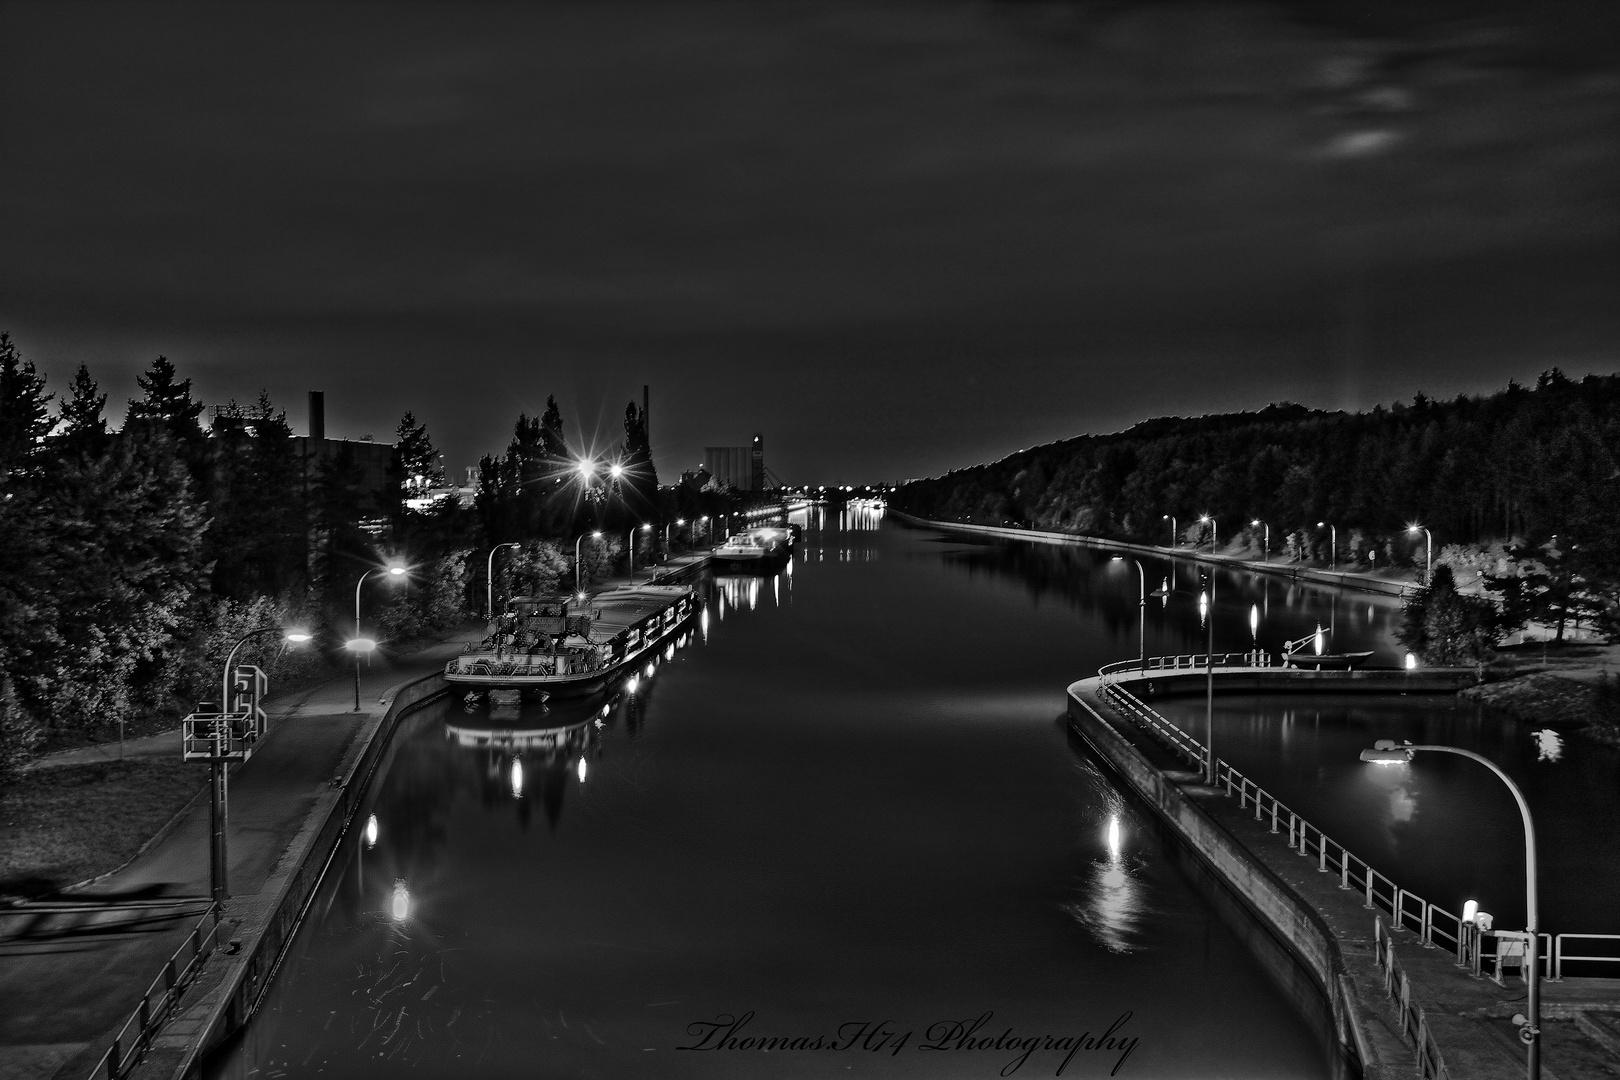 Nürnberg Hafen